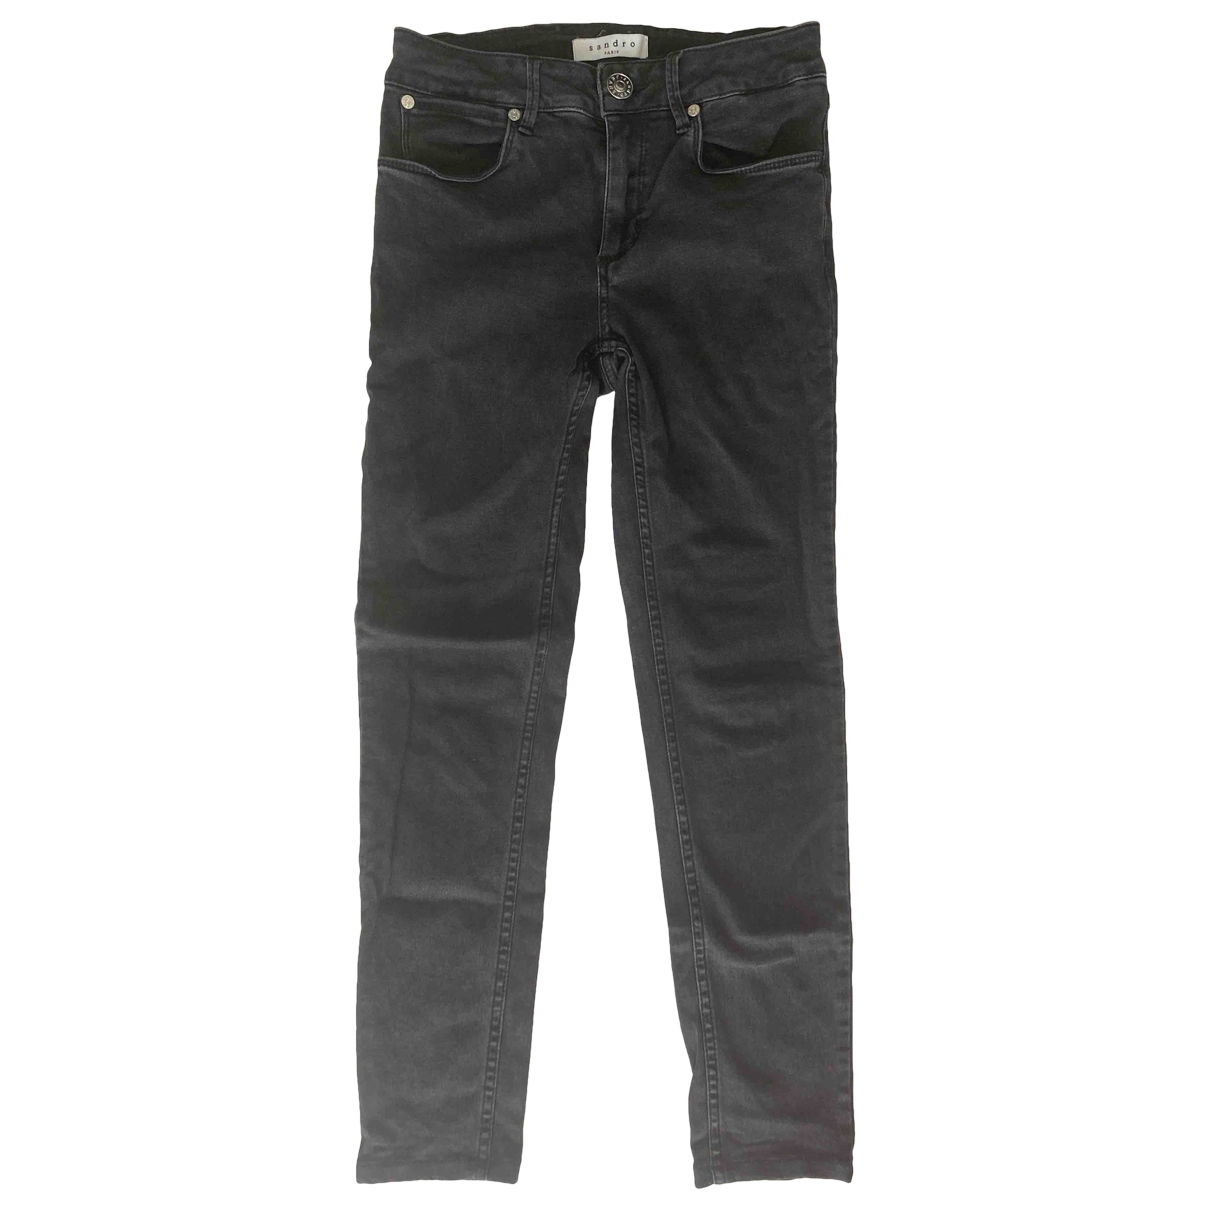 Sandro \N Grey Cotton - elasthane Jeans for Women 34 FR